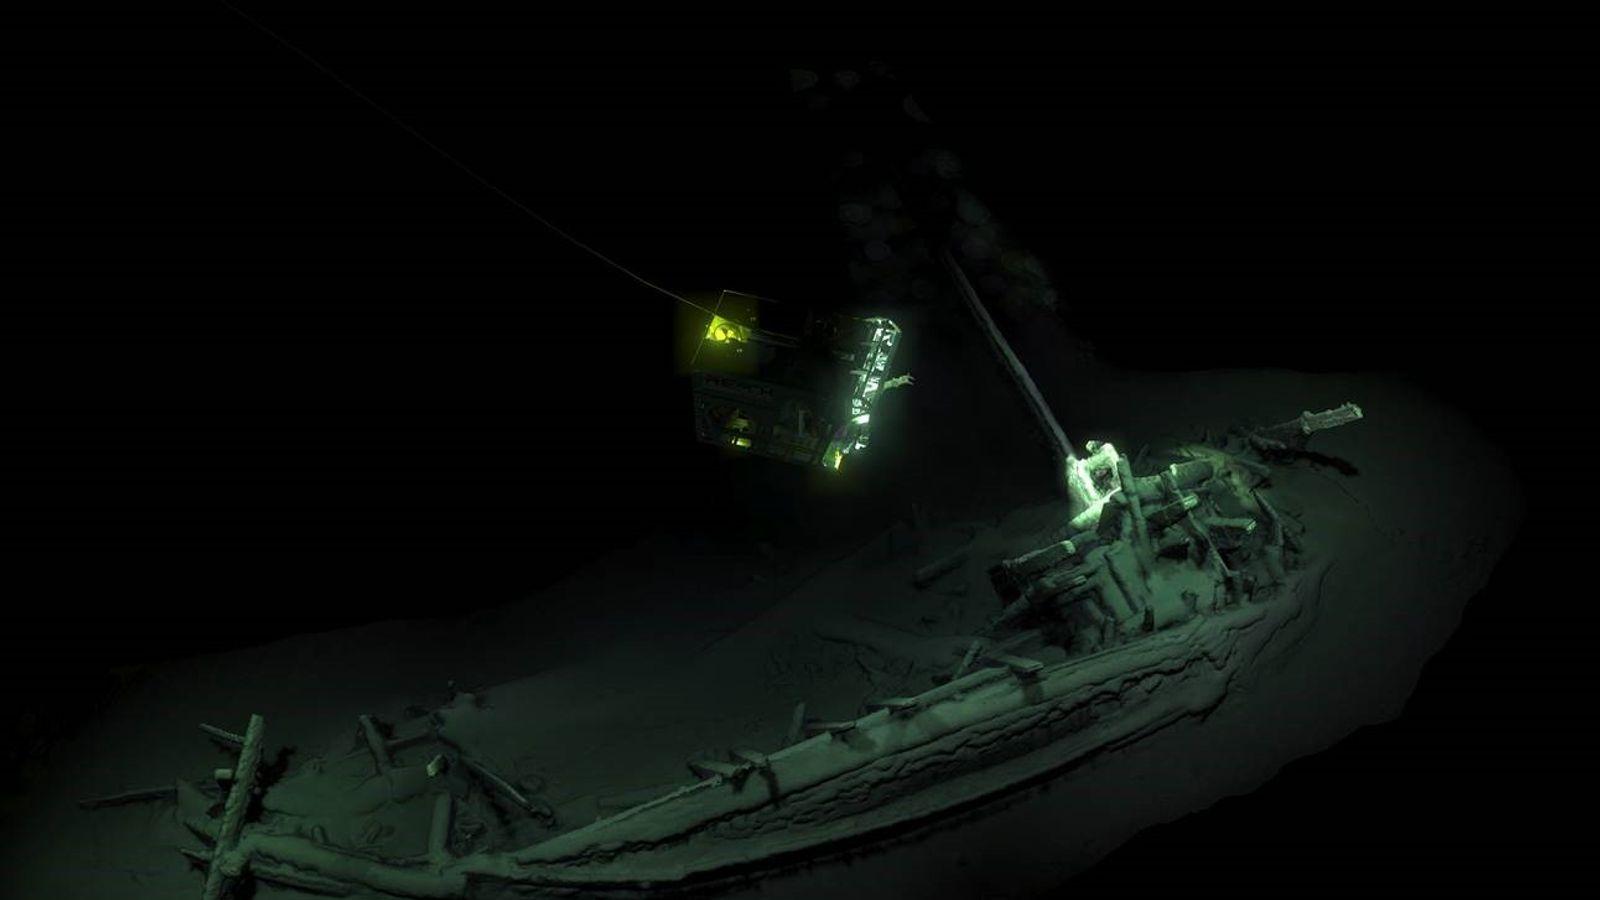 https://e3.365dm.com/18/10/1600x900/skynews-ship-archaeology_4461038.jpg?20181022162204